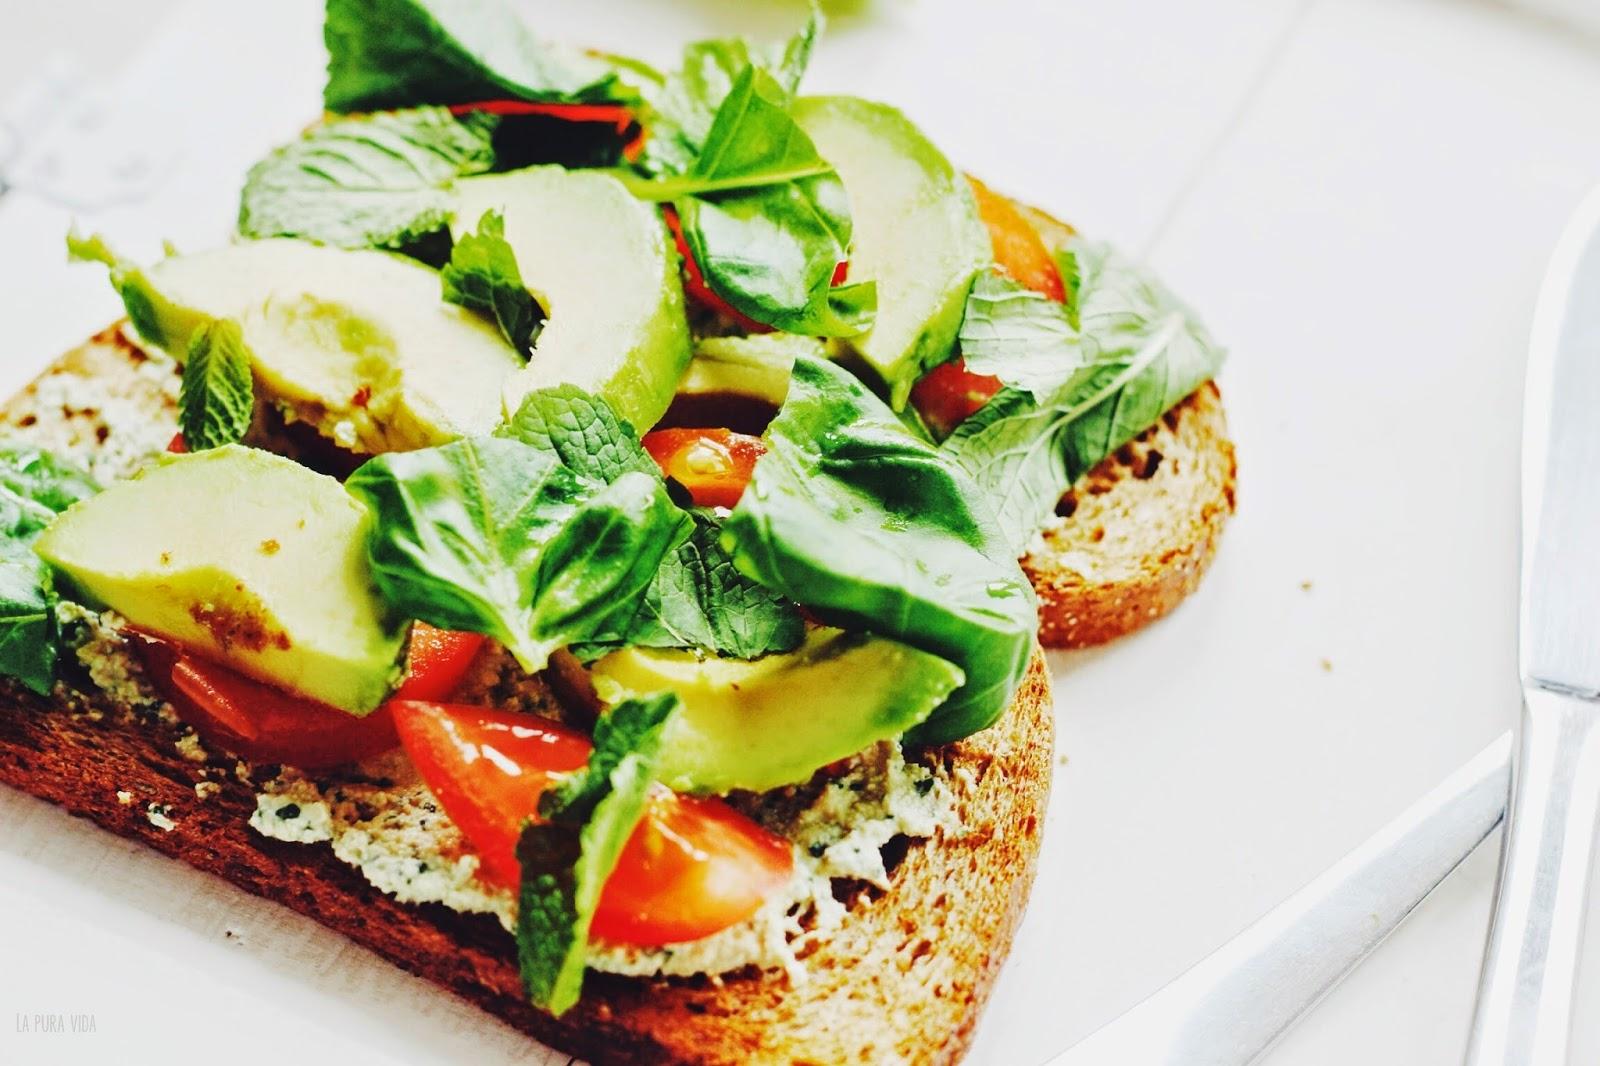 Broodje met Avocado, Tofoe en Verse Kruiden